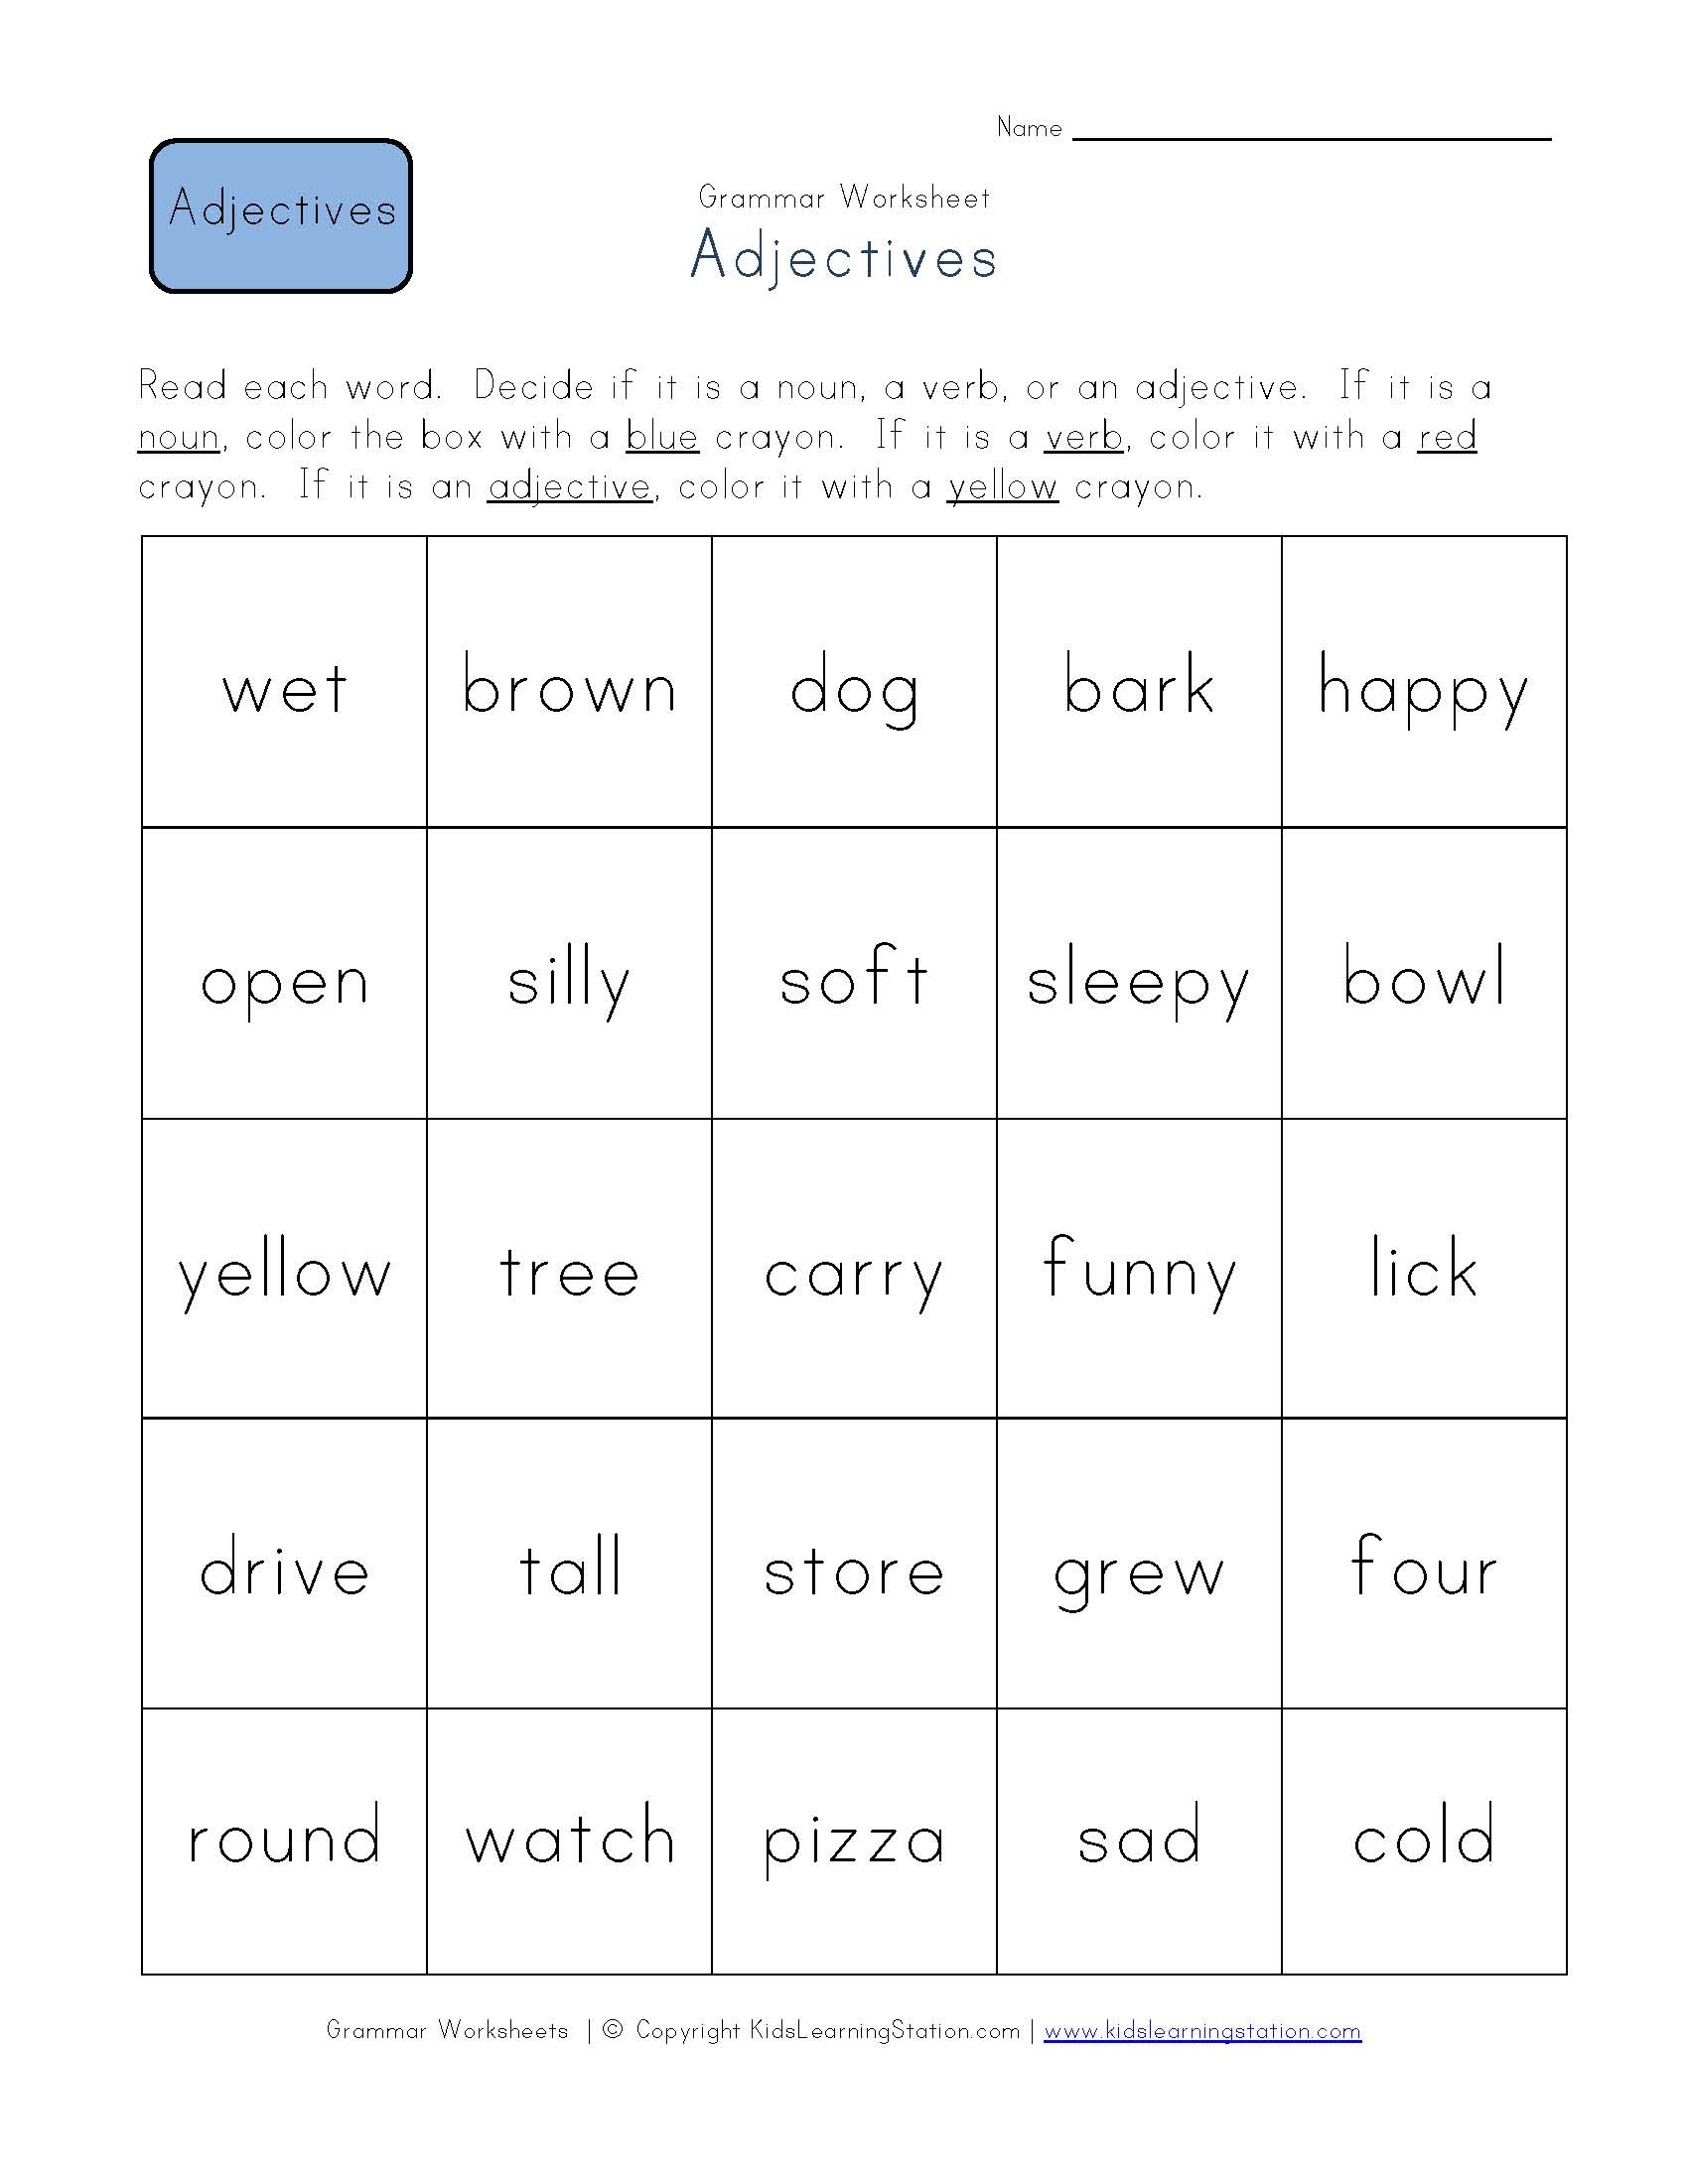 Grammar Worksheet Adjectives